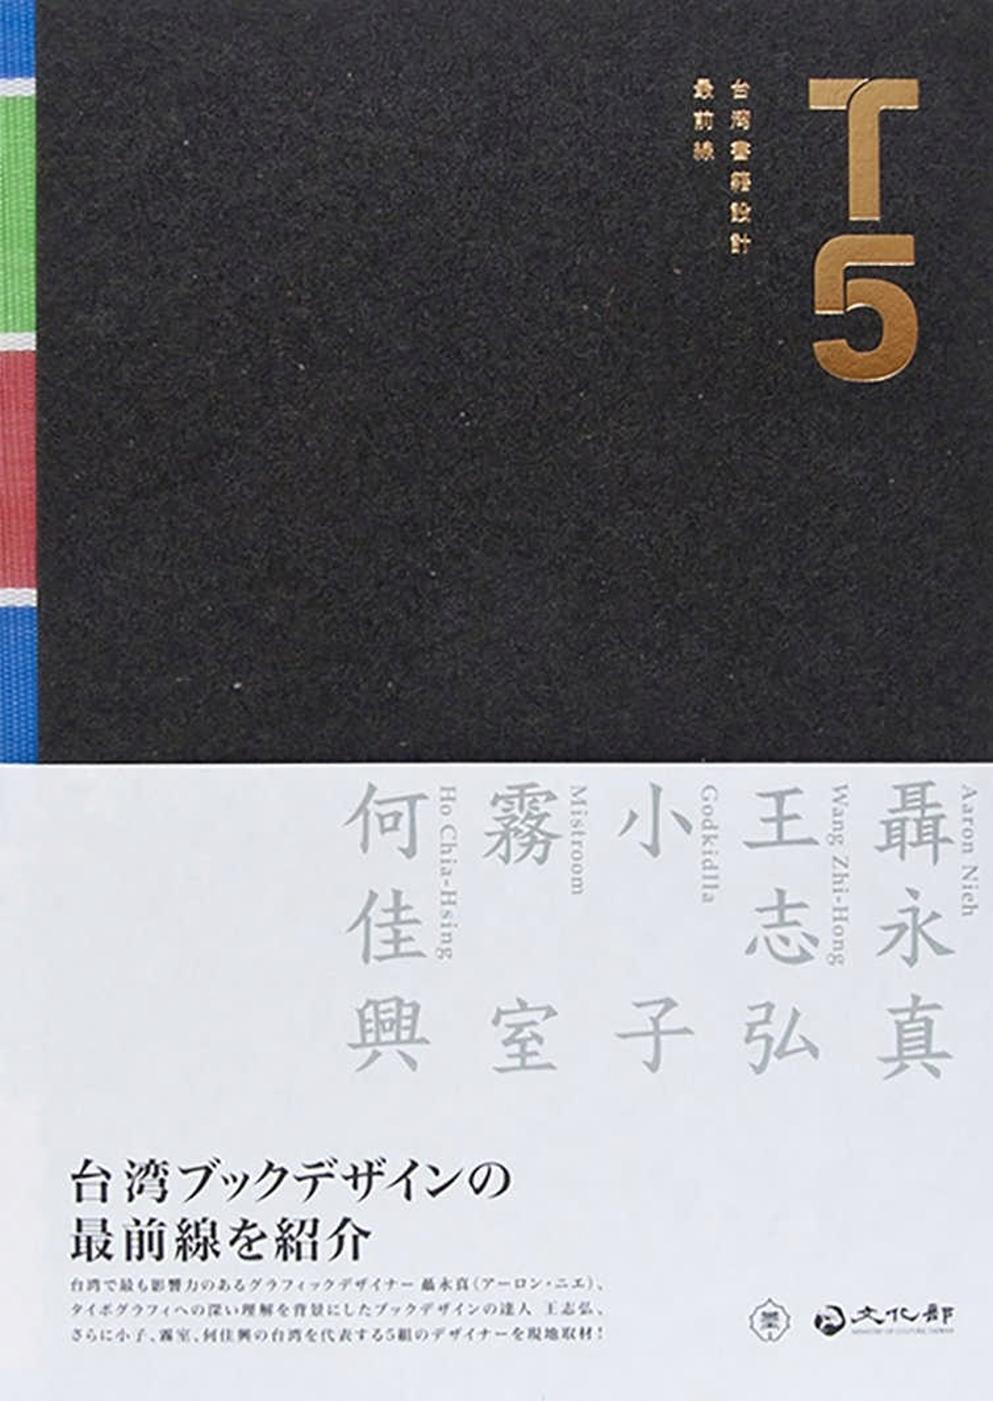 T5:台湾書籍設計最前線